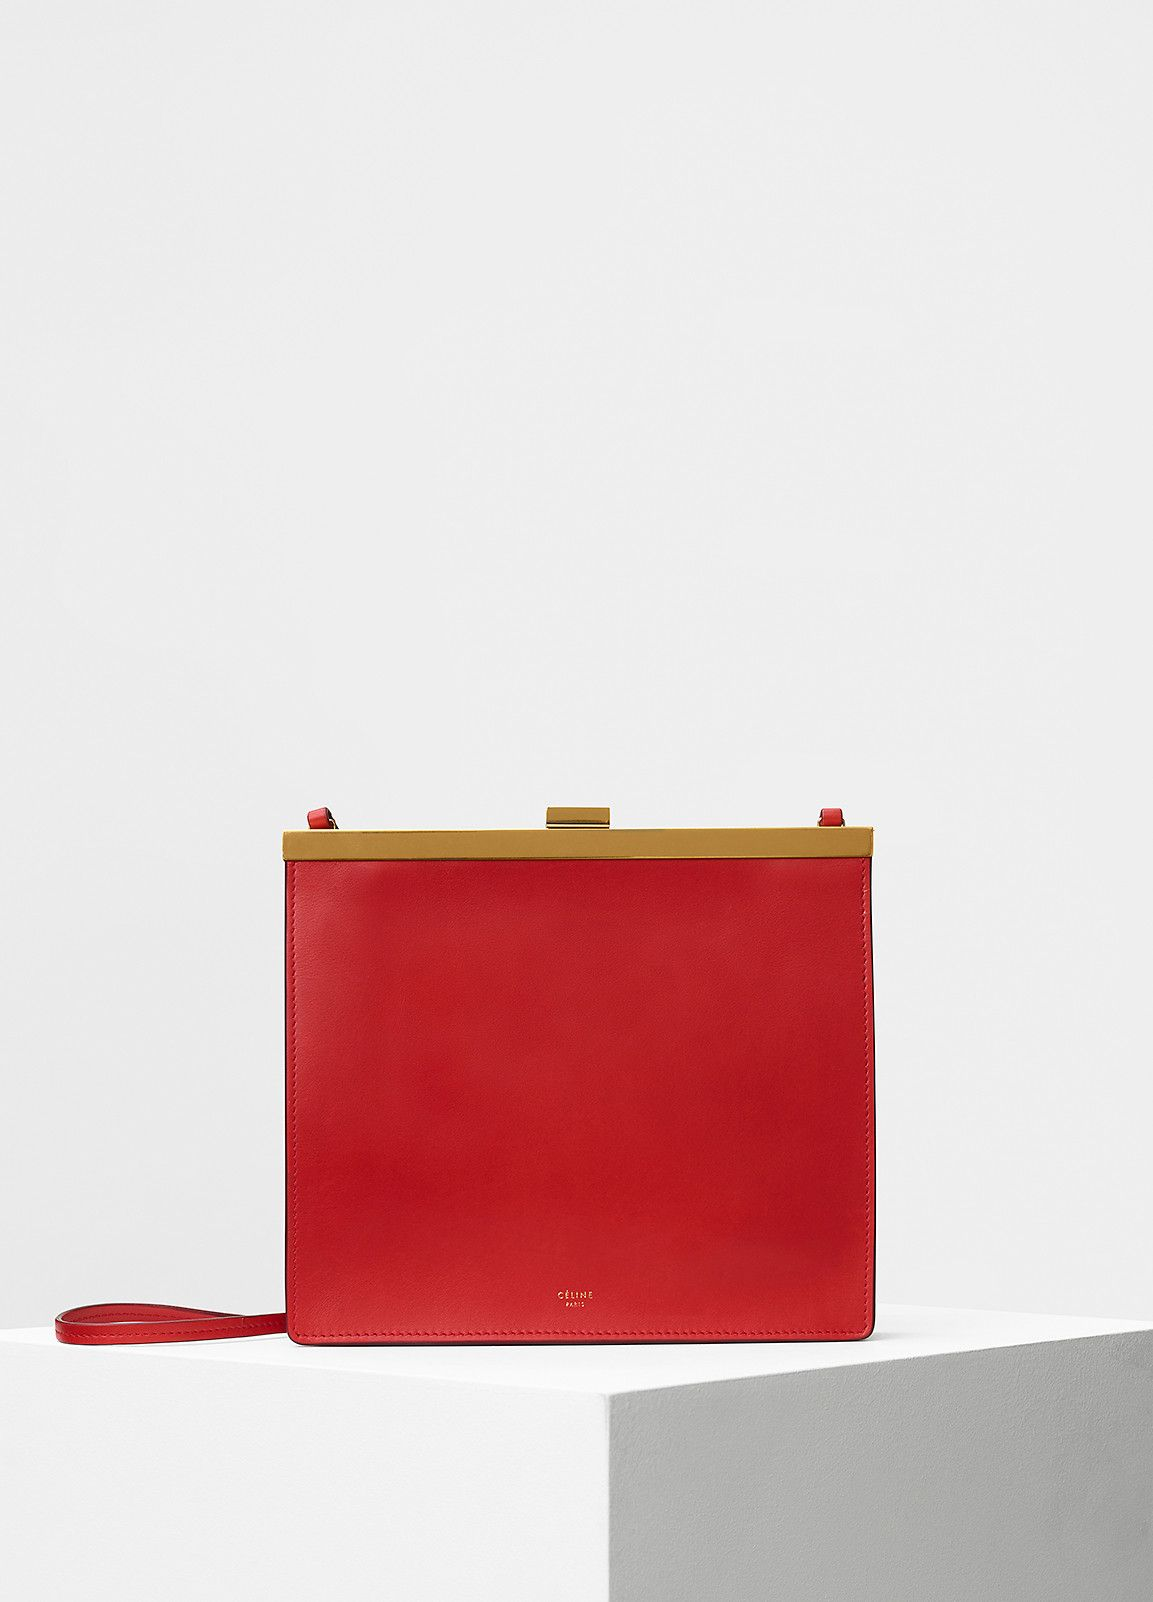 CÉLINE - Mini Clasp Shoulder Bag in Scarlet Natural Calfskin  a10513de907e0